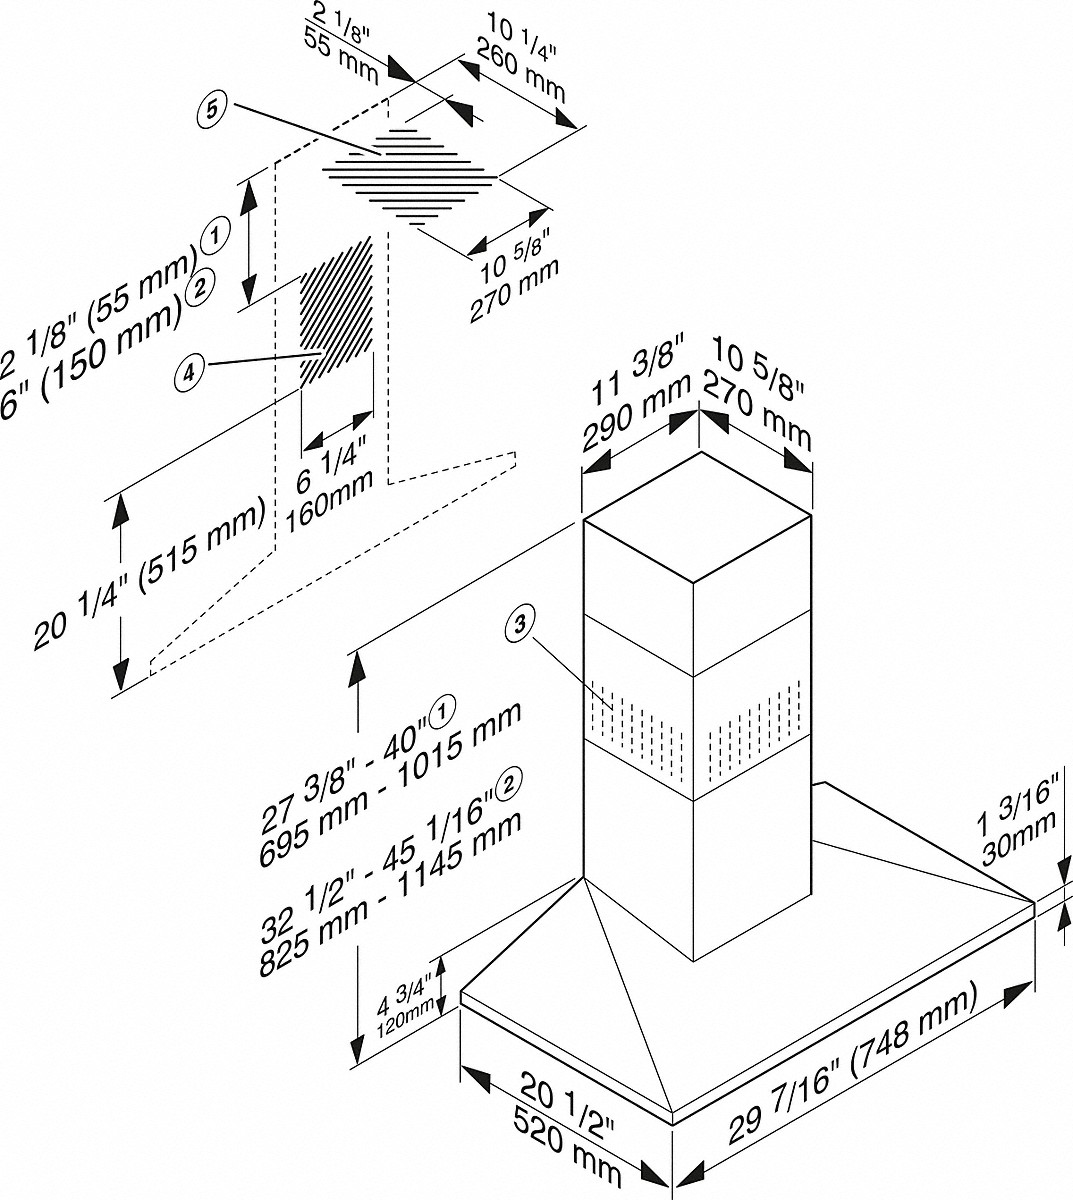 Miele Da 398 7 Classic 30 Inch Wall Mounted Ventilation Hood